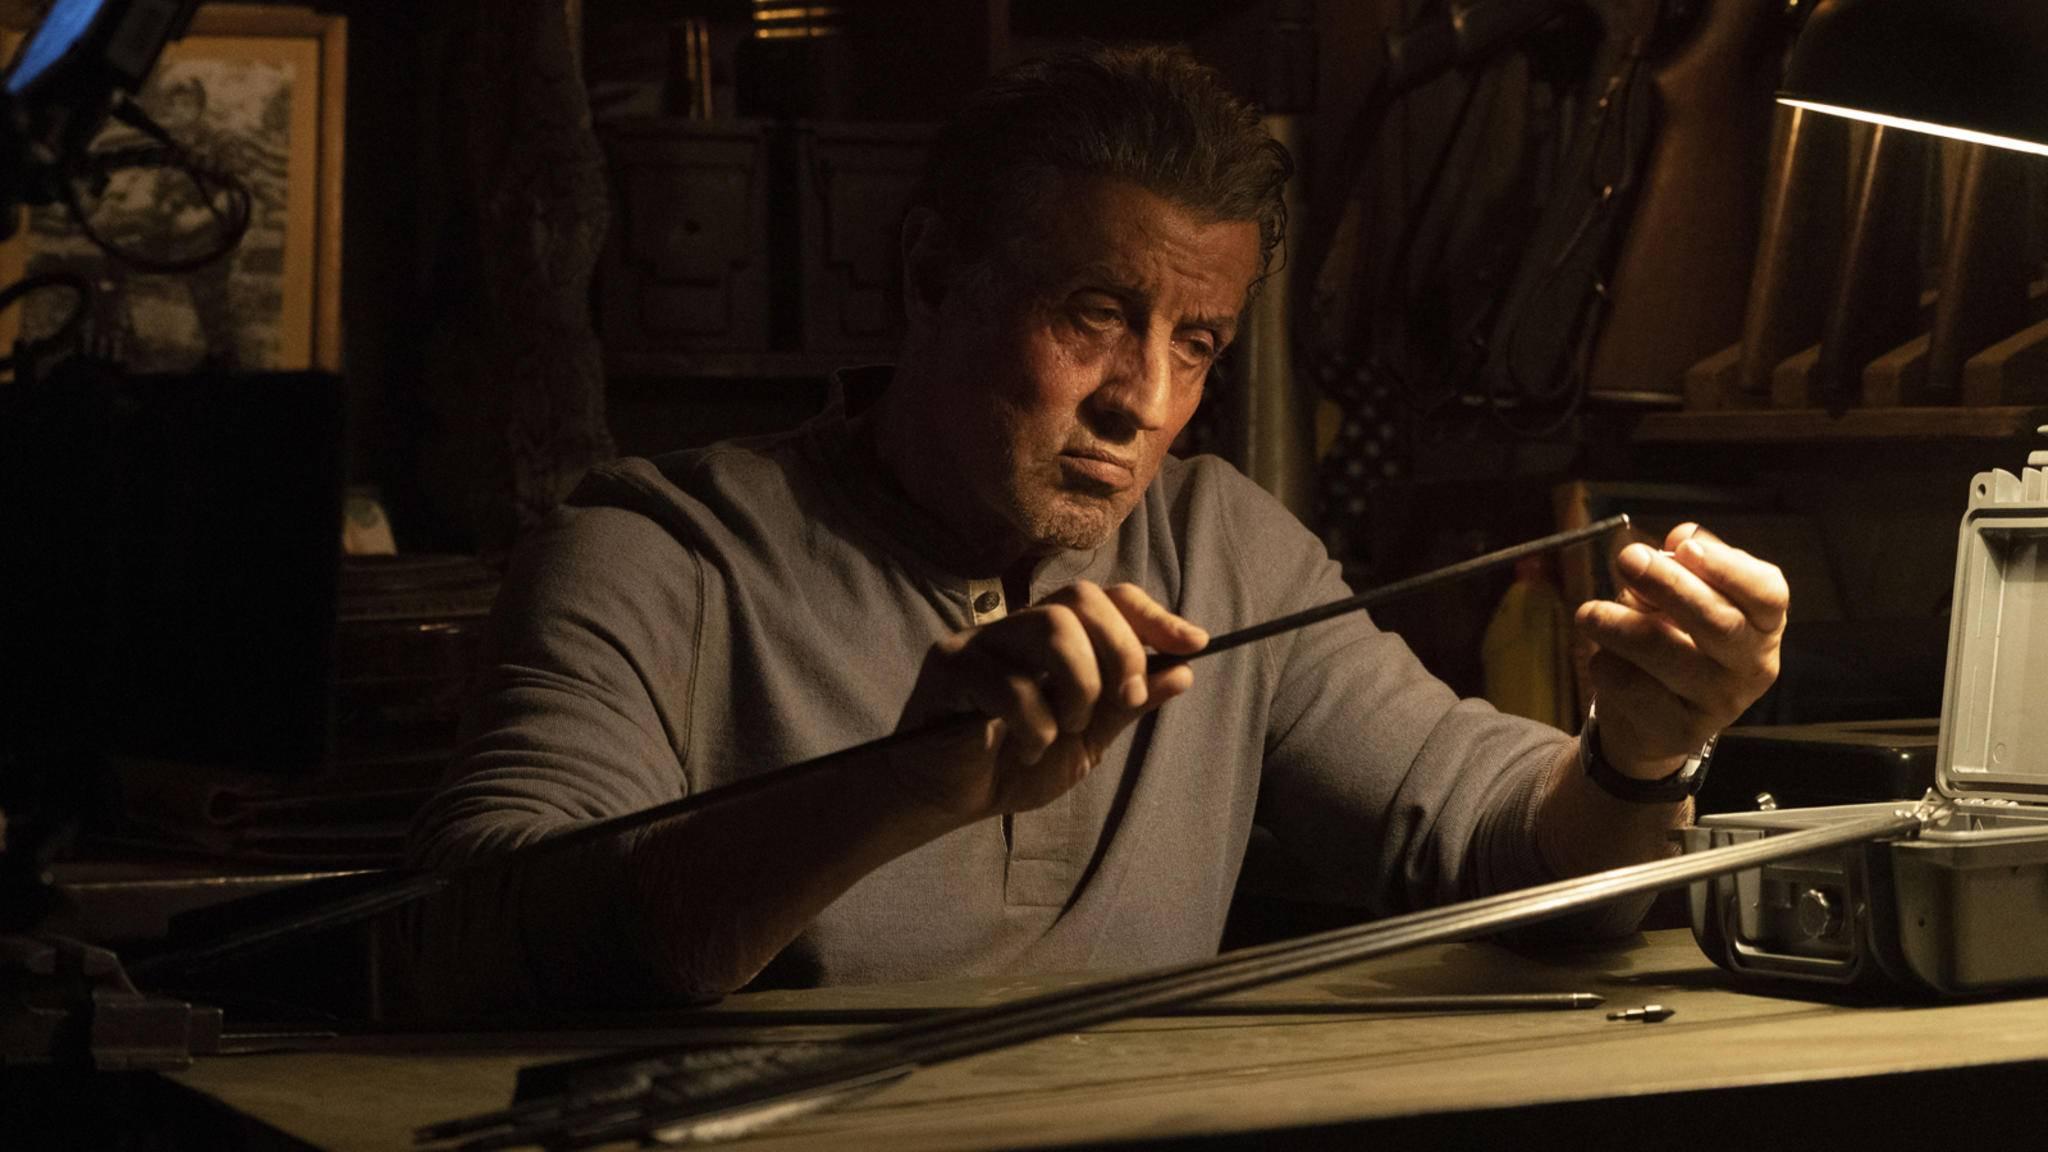 Rambo 5 Last Blood-Sylvester Stallone als John Rambo-Universum Film